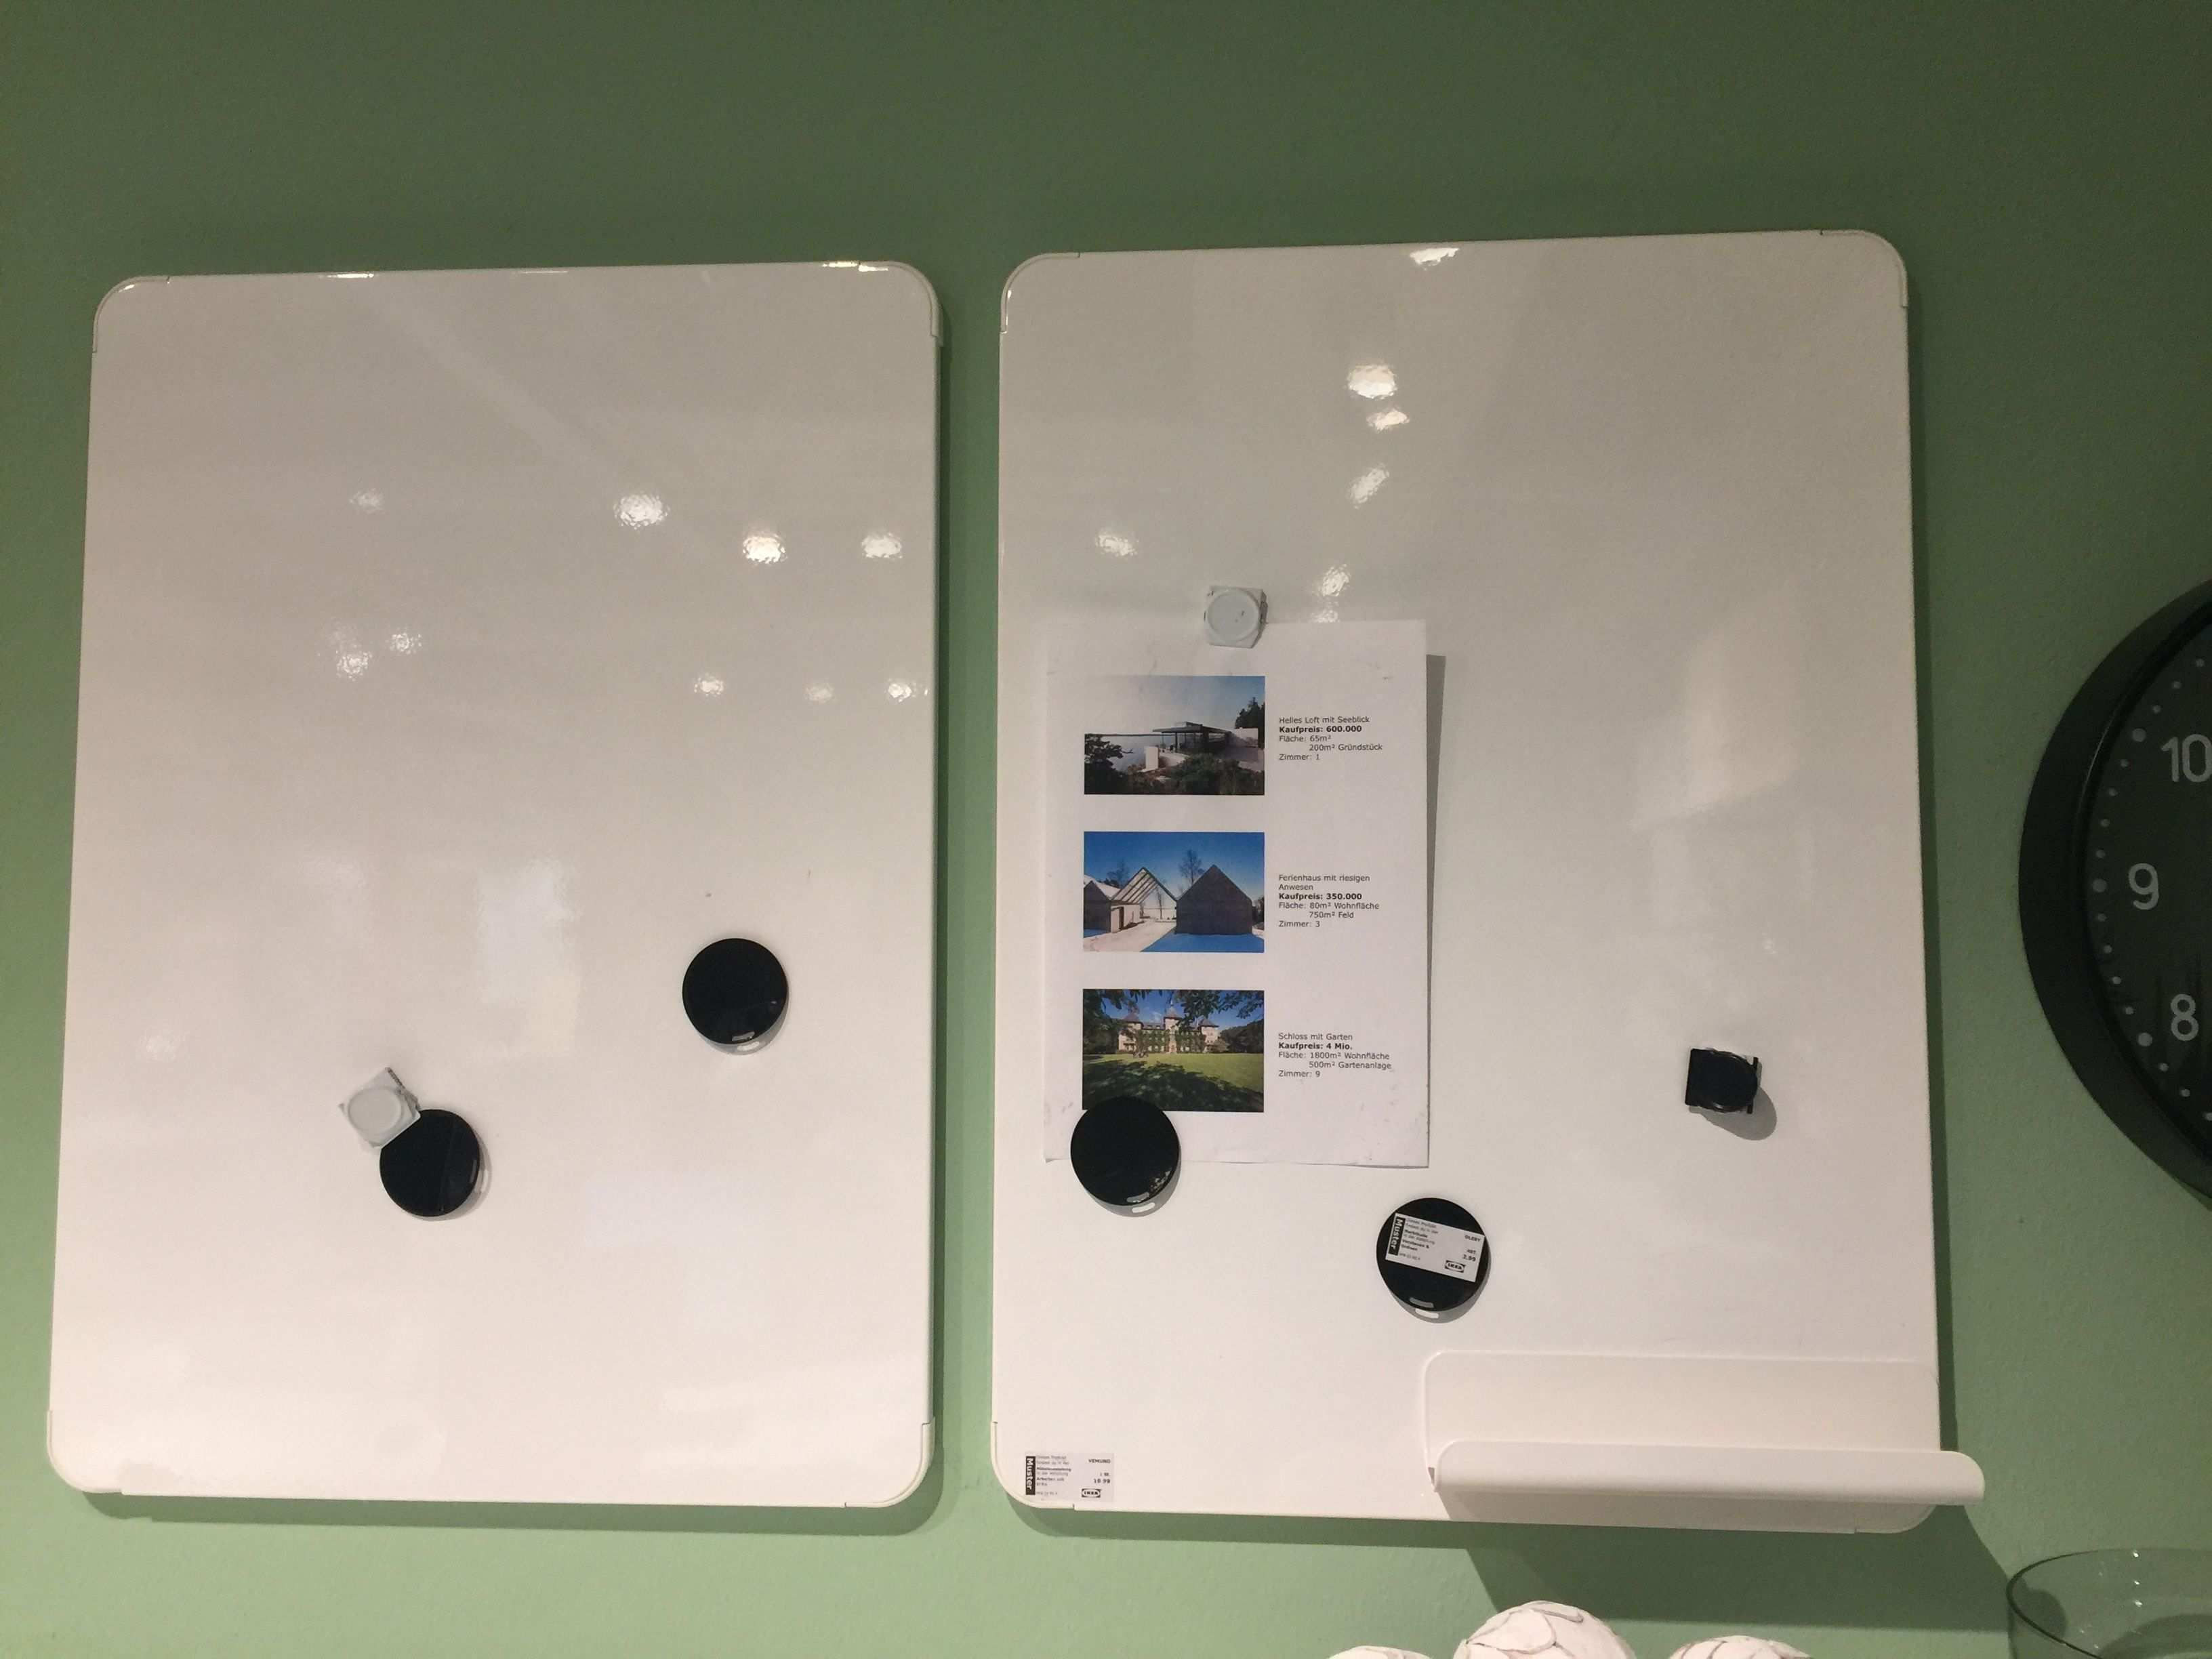 Weisse Magnetpinnwand Von Ikea Like Magnetpinnwand Ideen Liebe Grusse